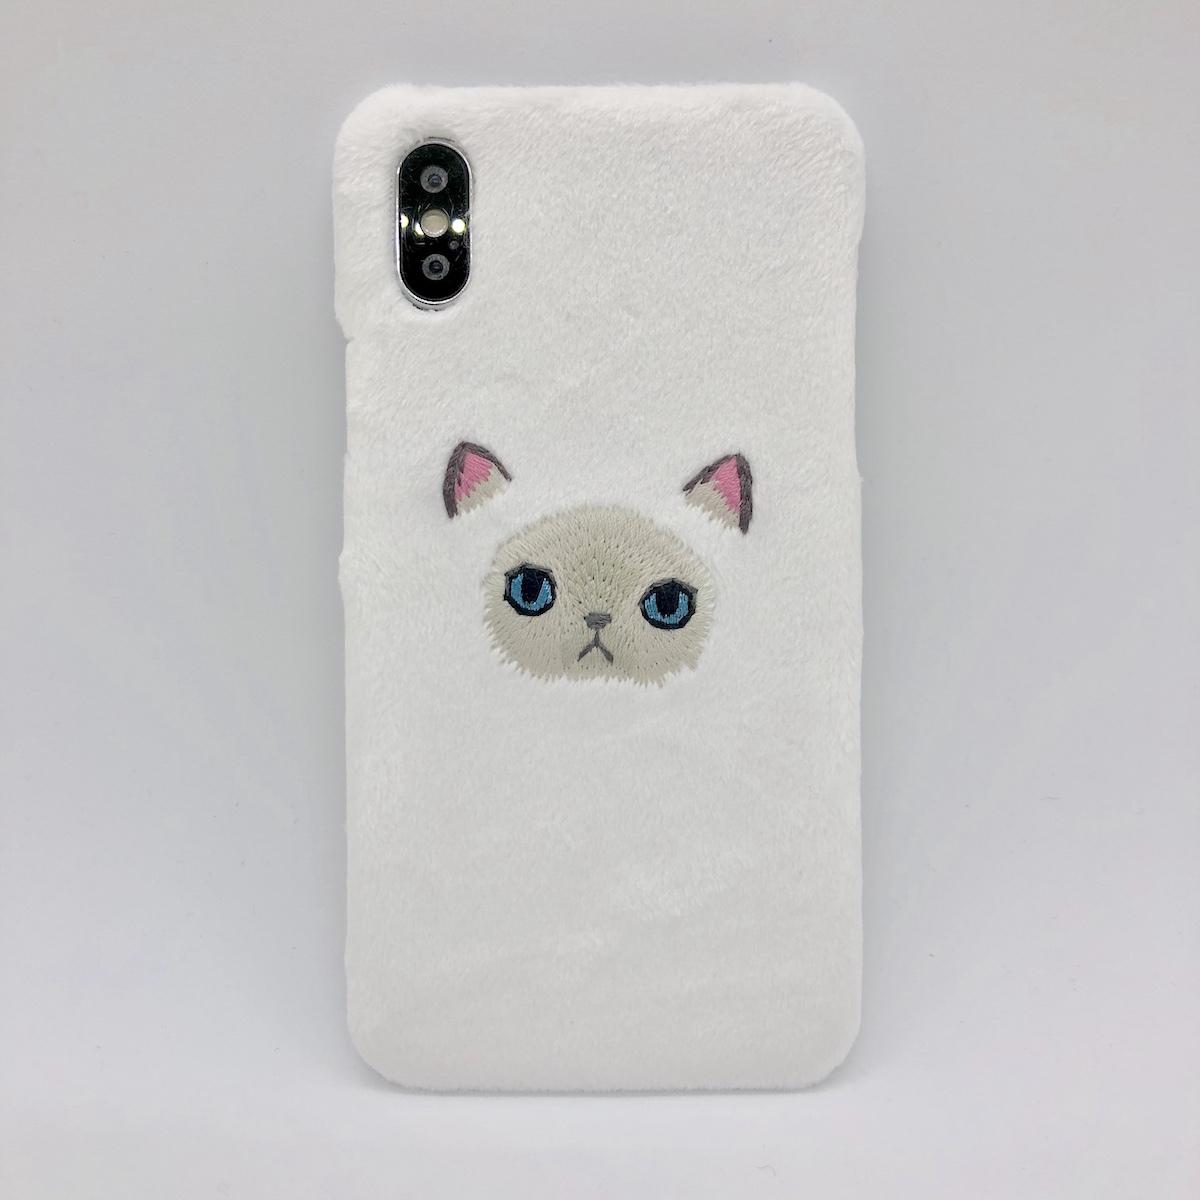 【iPhoneX/Xs専用】ヒマラヤンiPhoneケース【新生地】